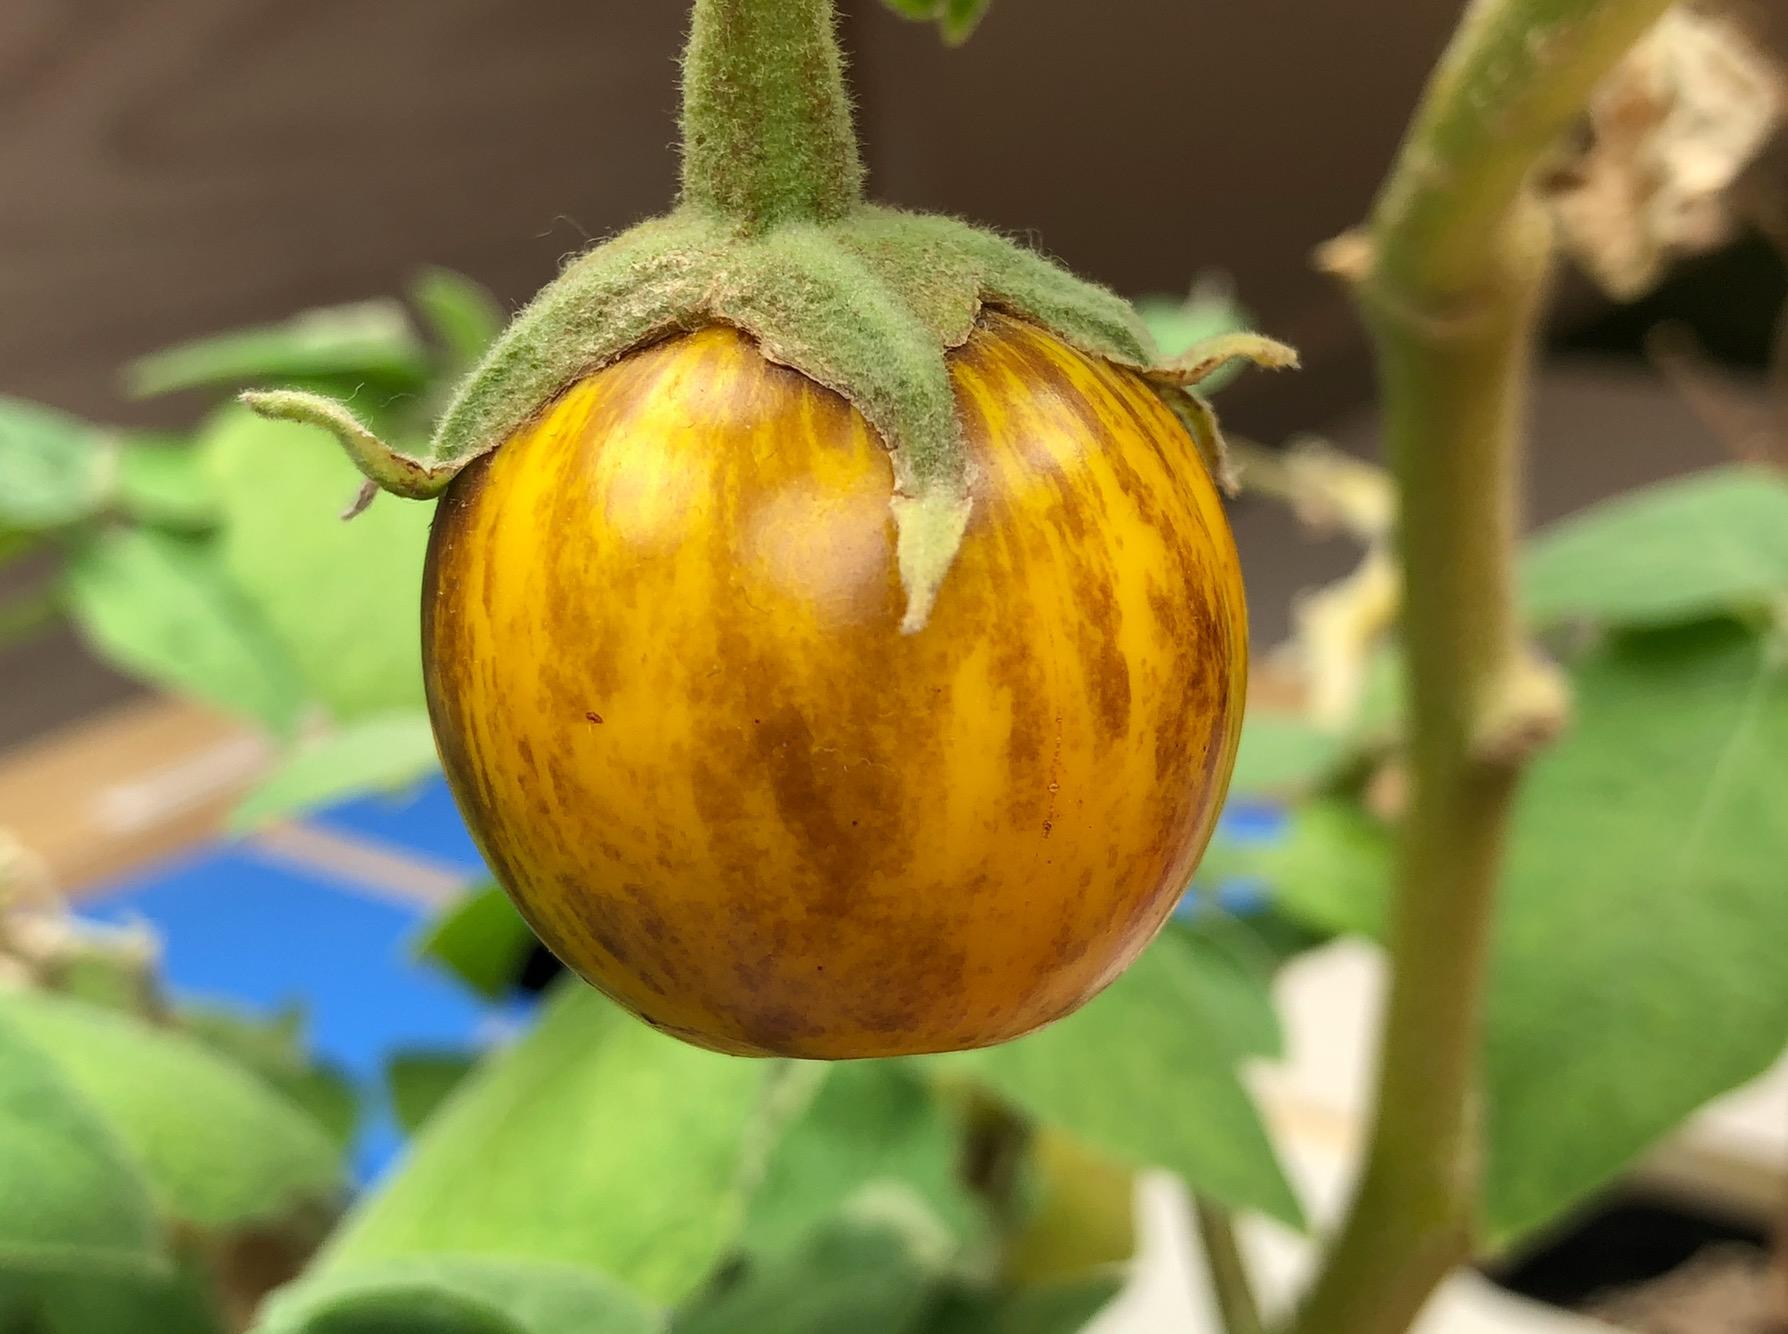 Eggplant growing indoors. Easthampton, MA. ©2017 sean walmsley